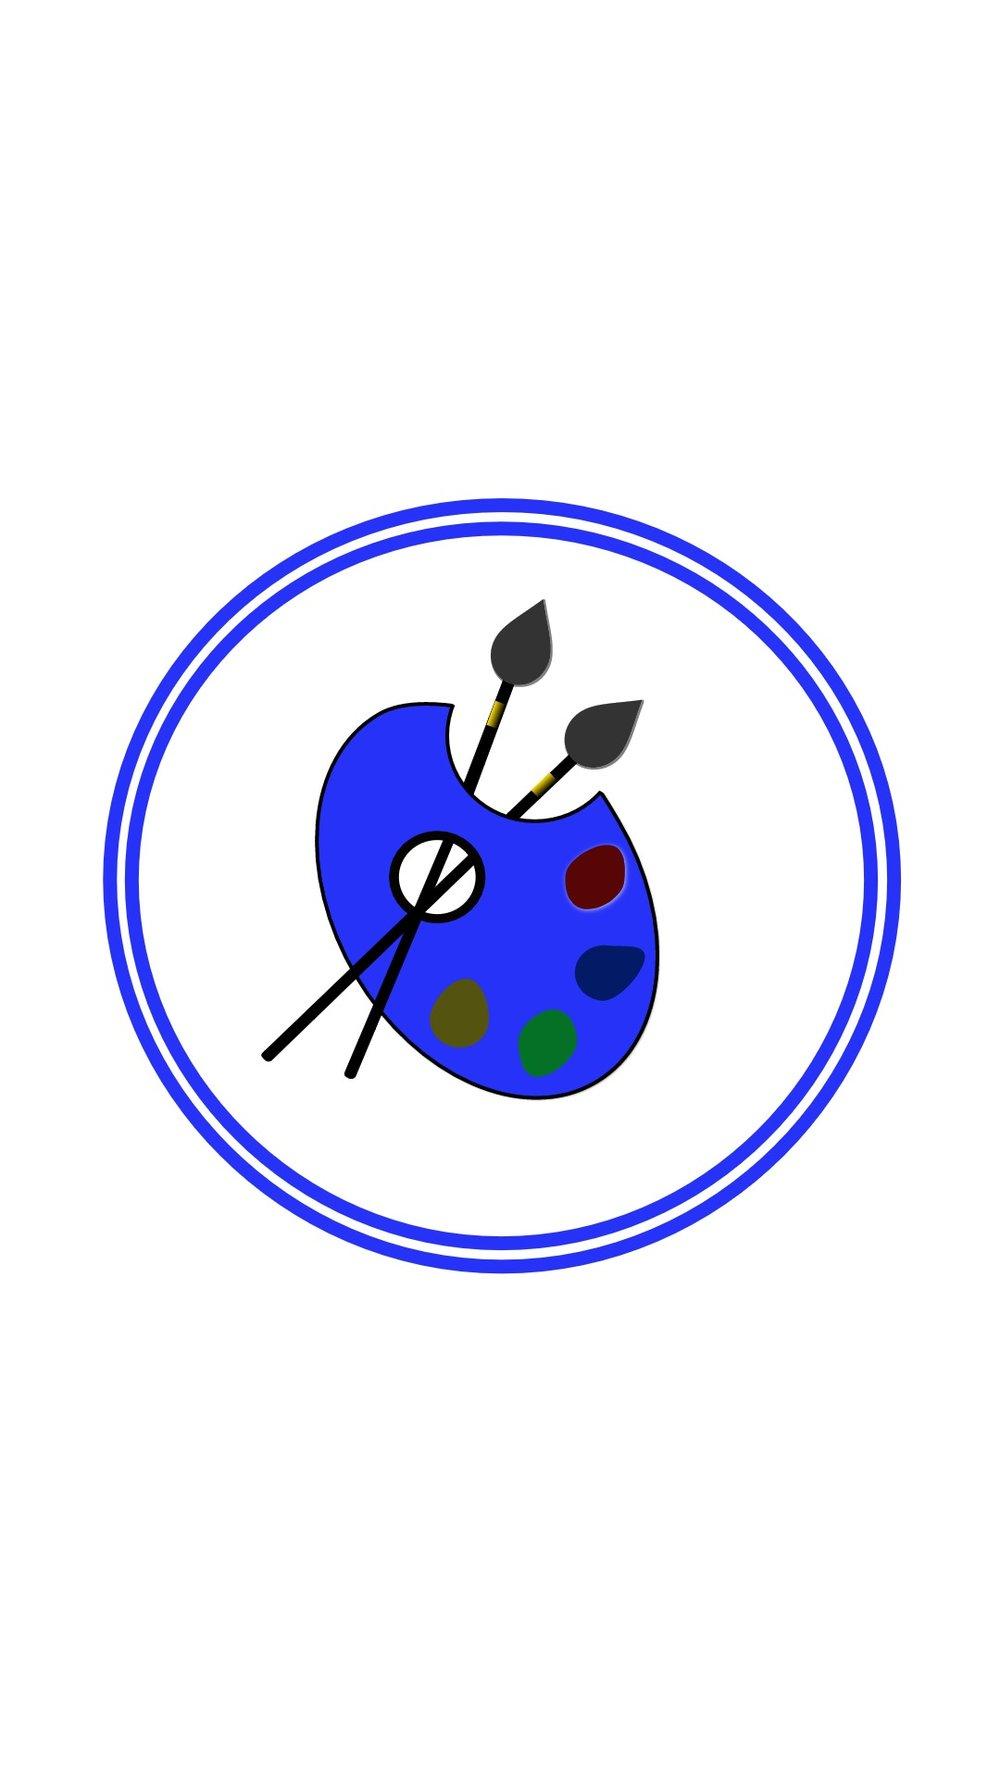 Instagram-cover-painting-blue-lotnotes.com.jpg